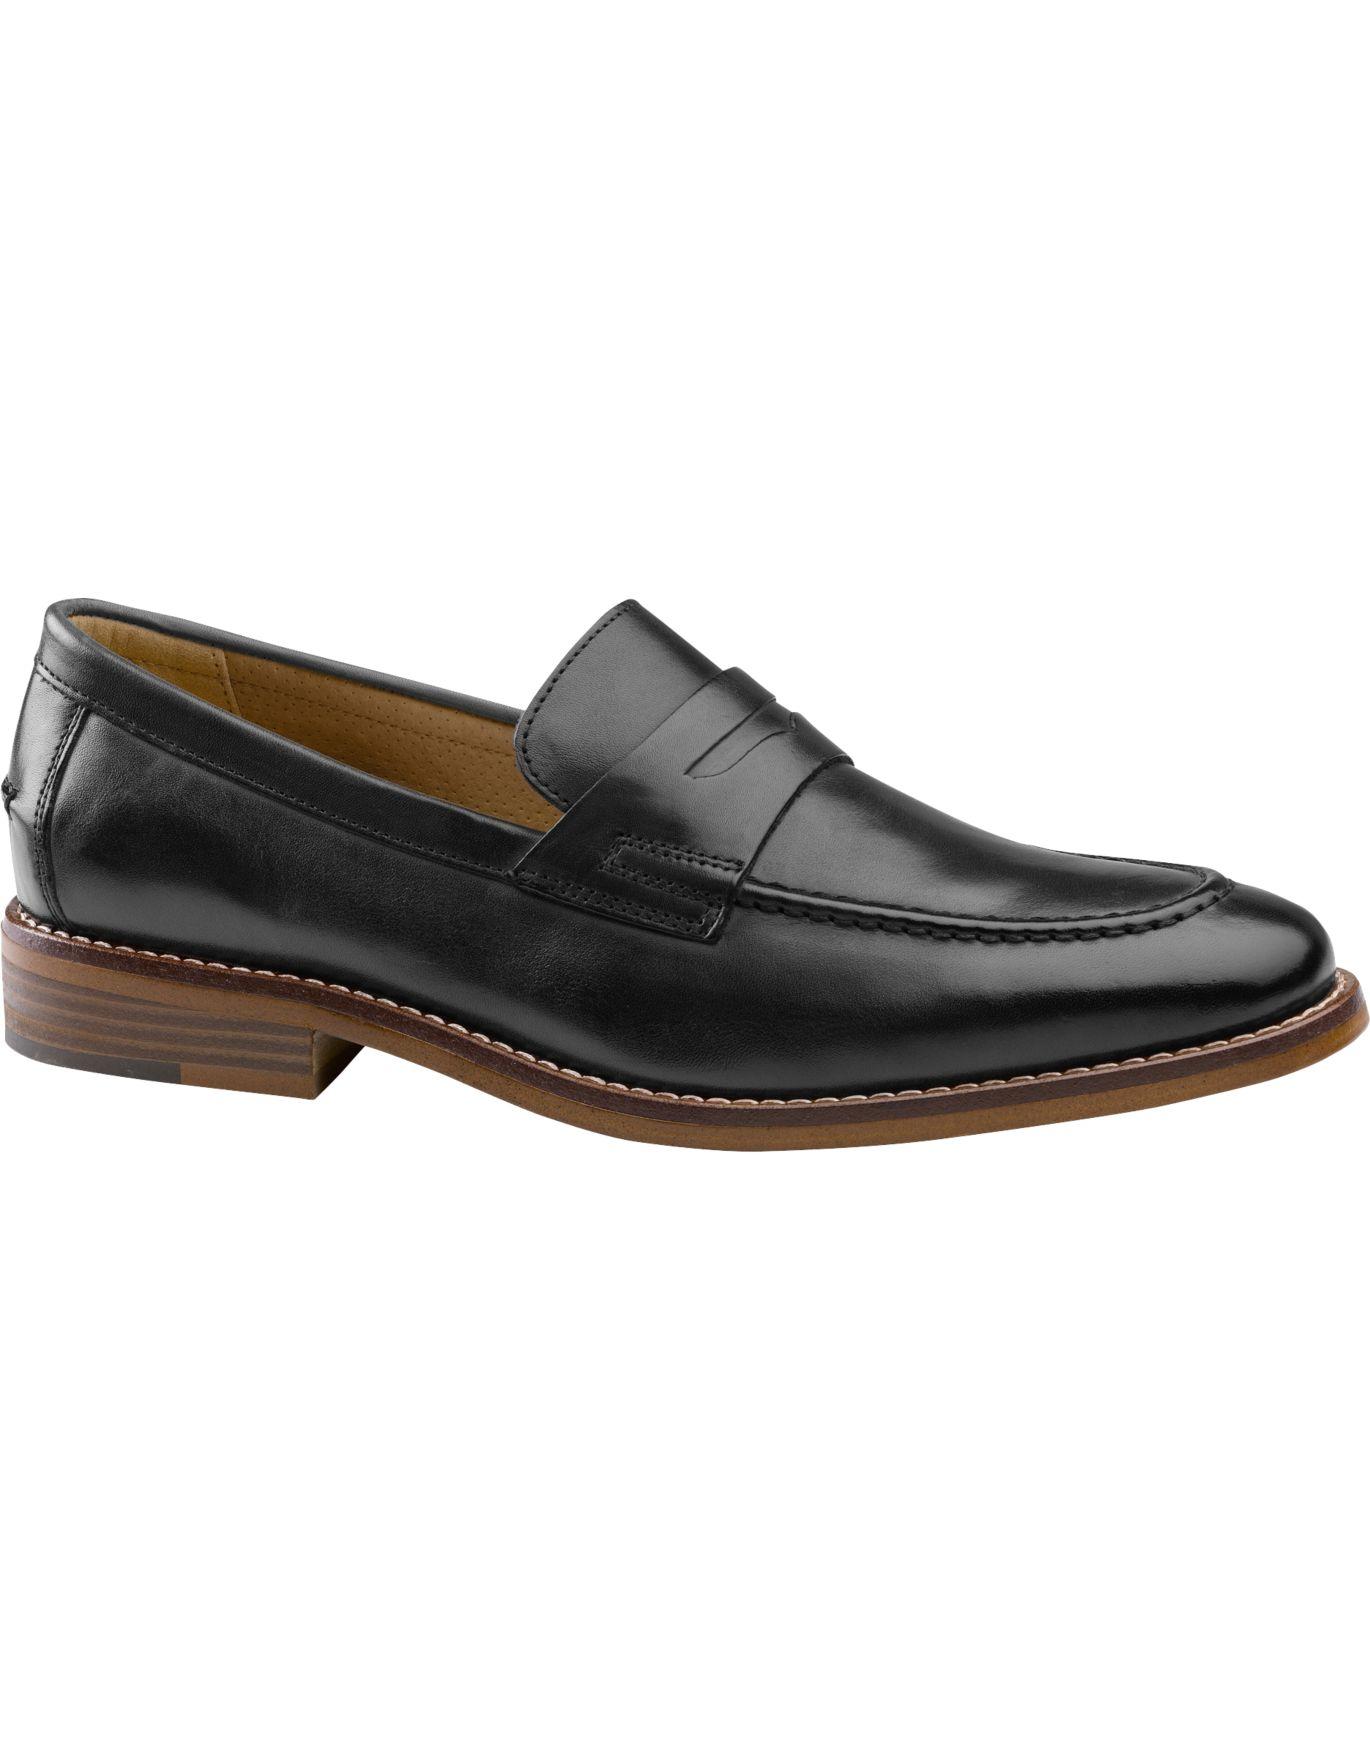 Cheap Quality Mens Shoes Uk